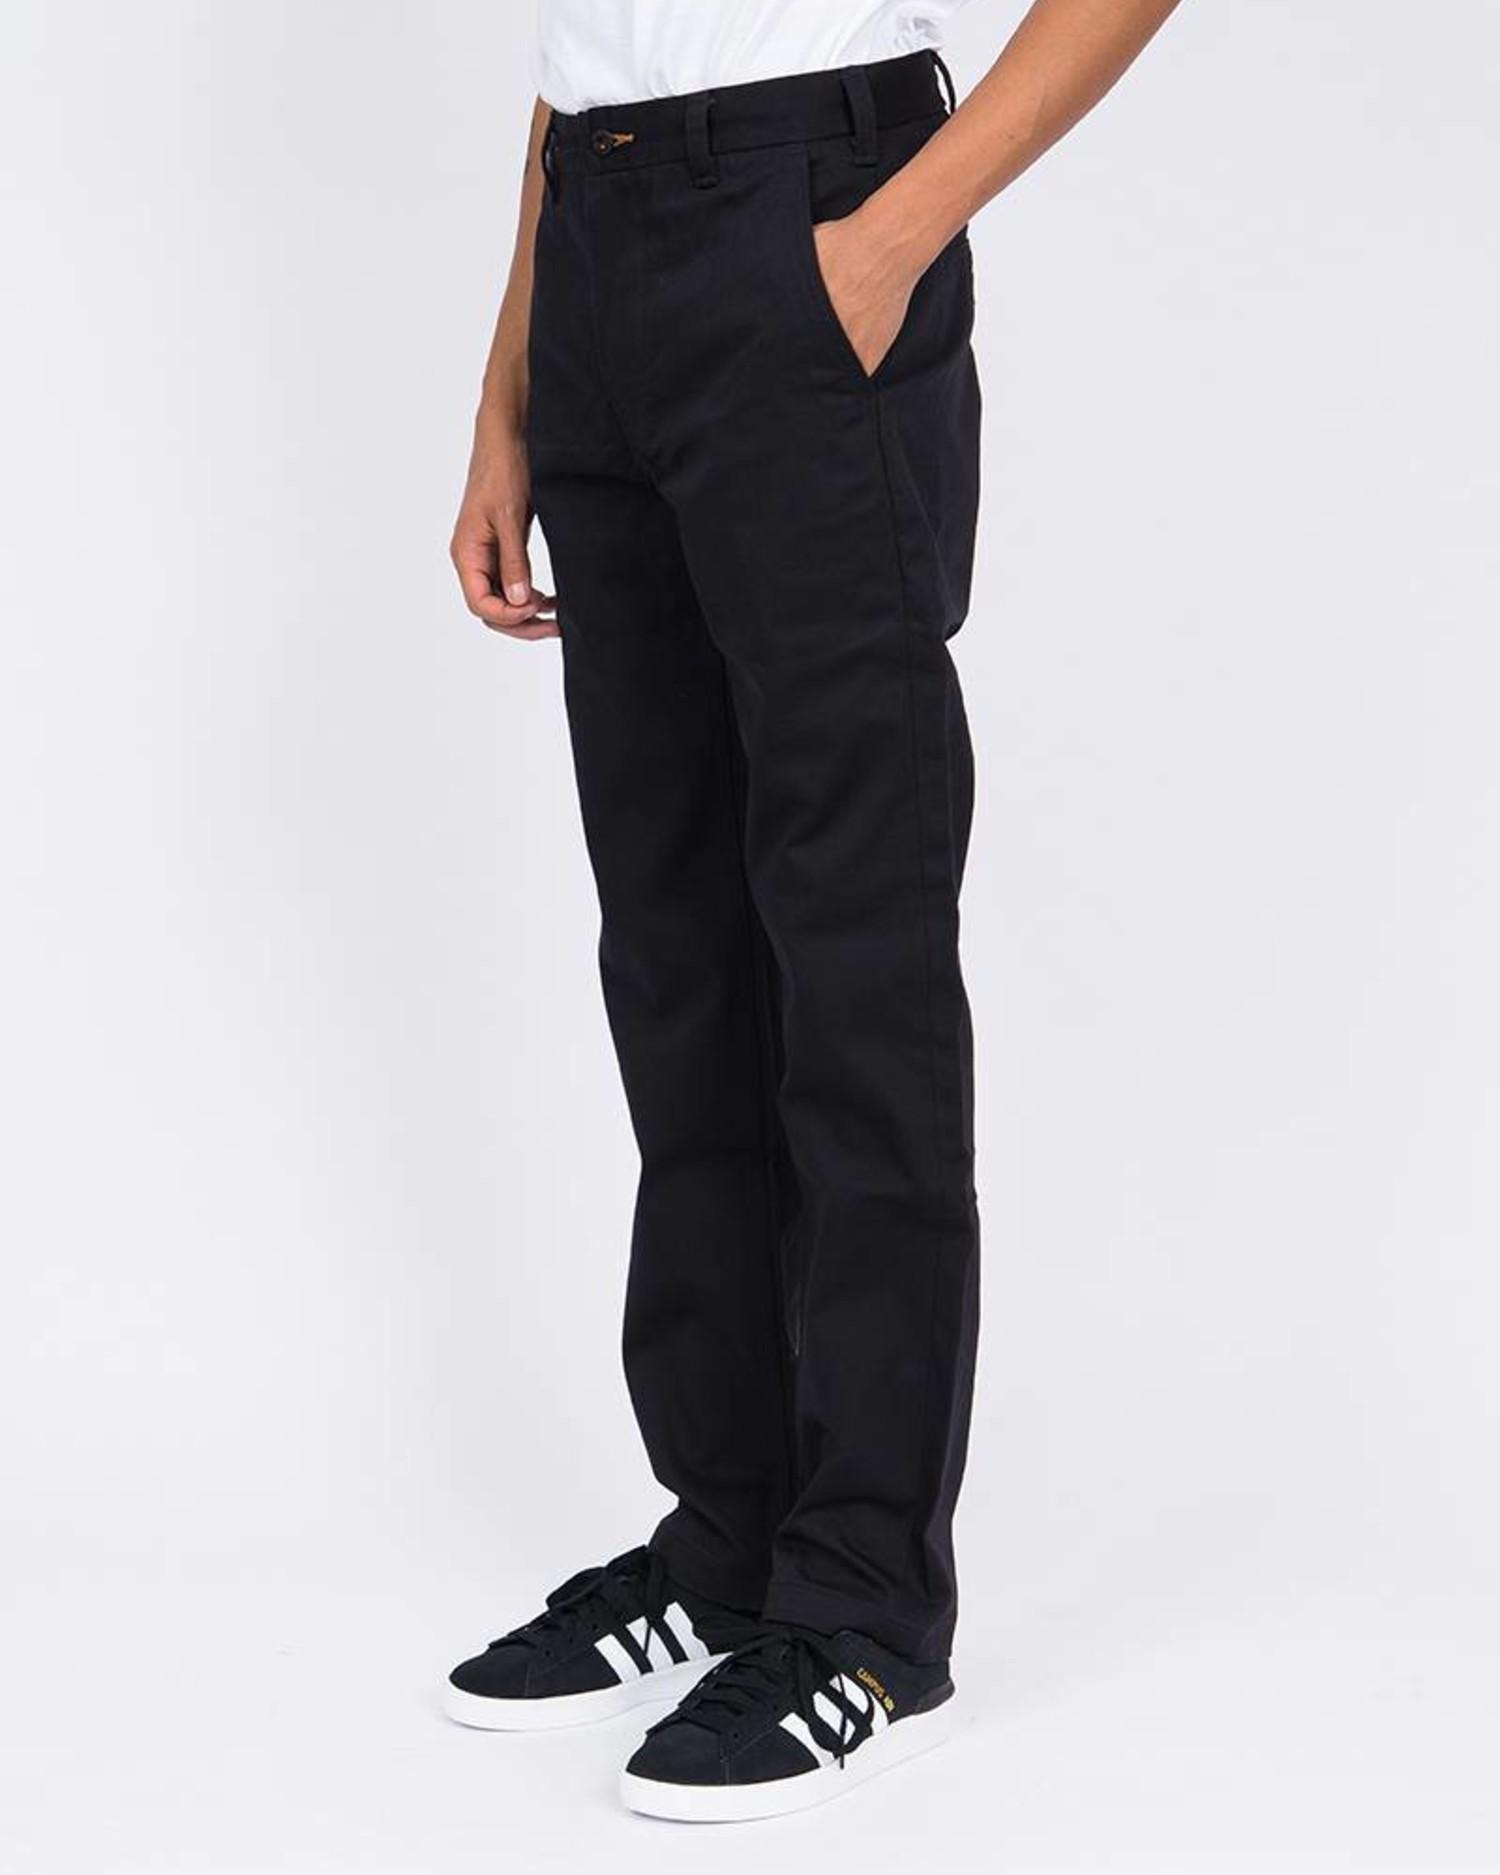 Levi's Skate Work Pants Black Twill